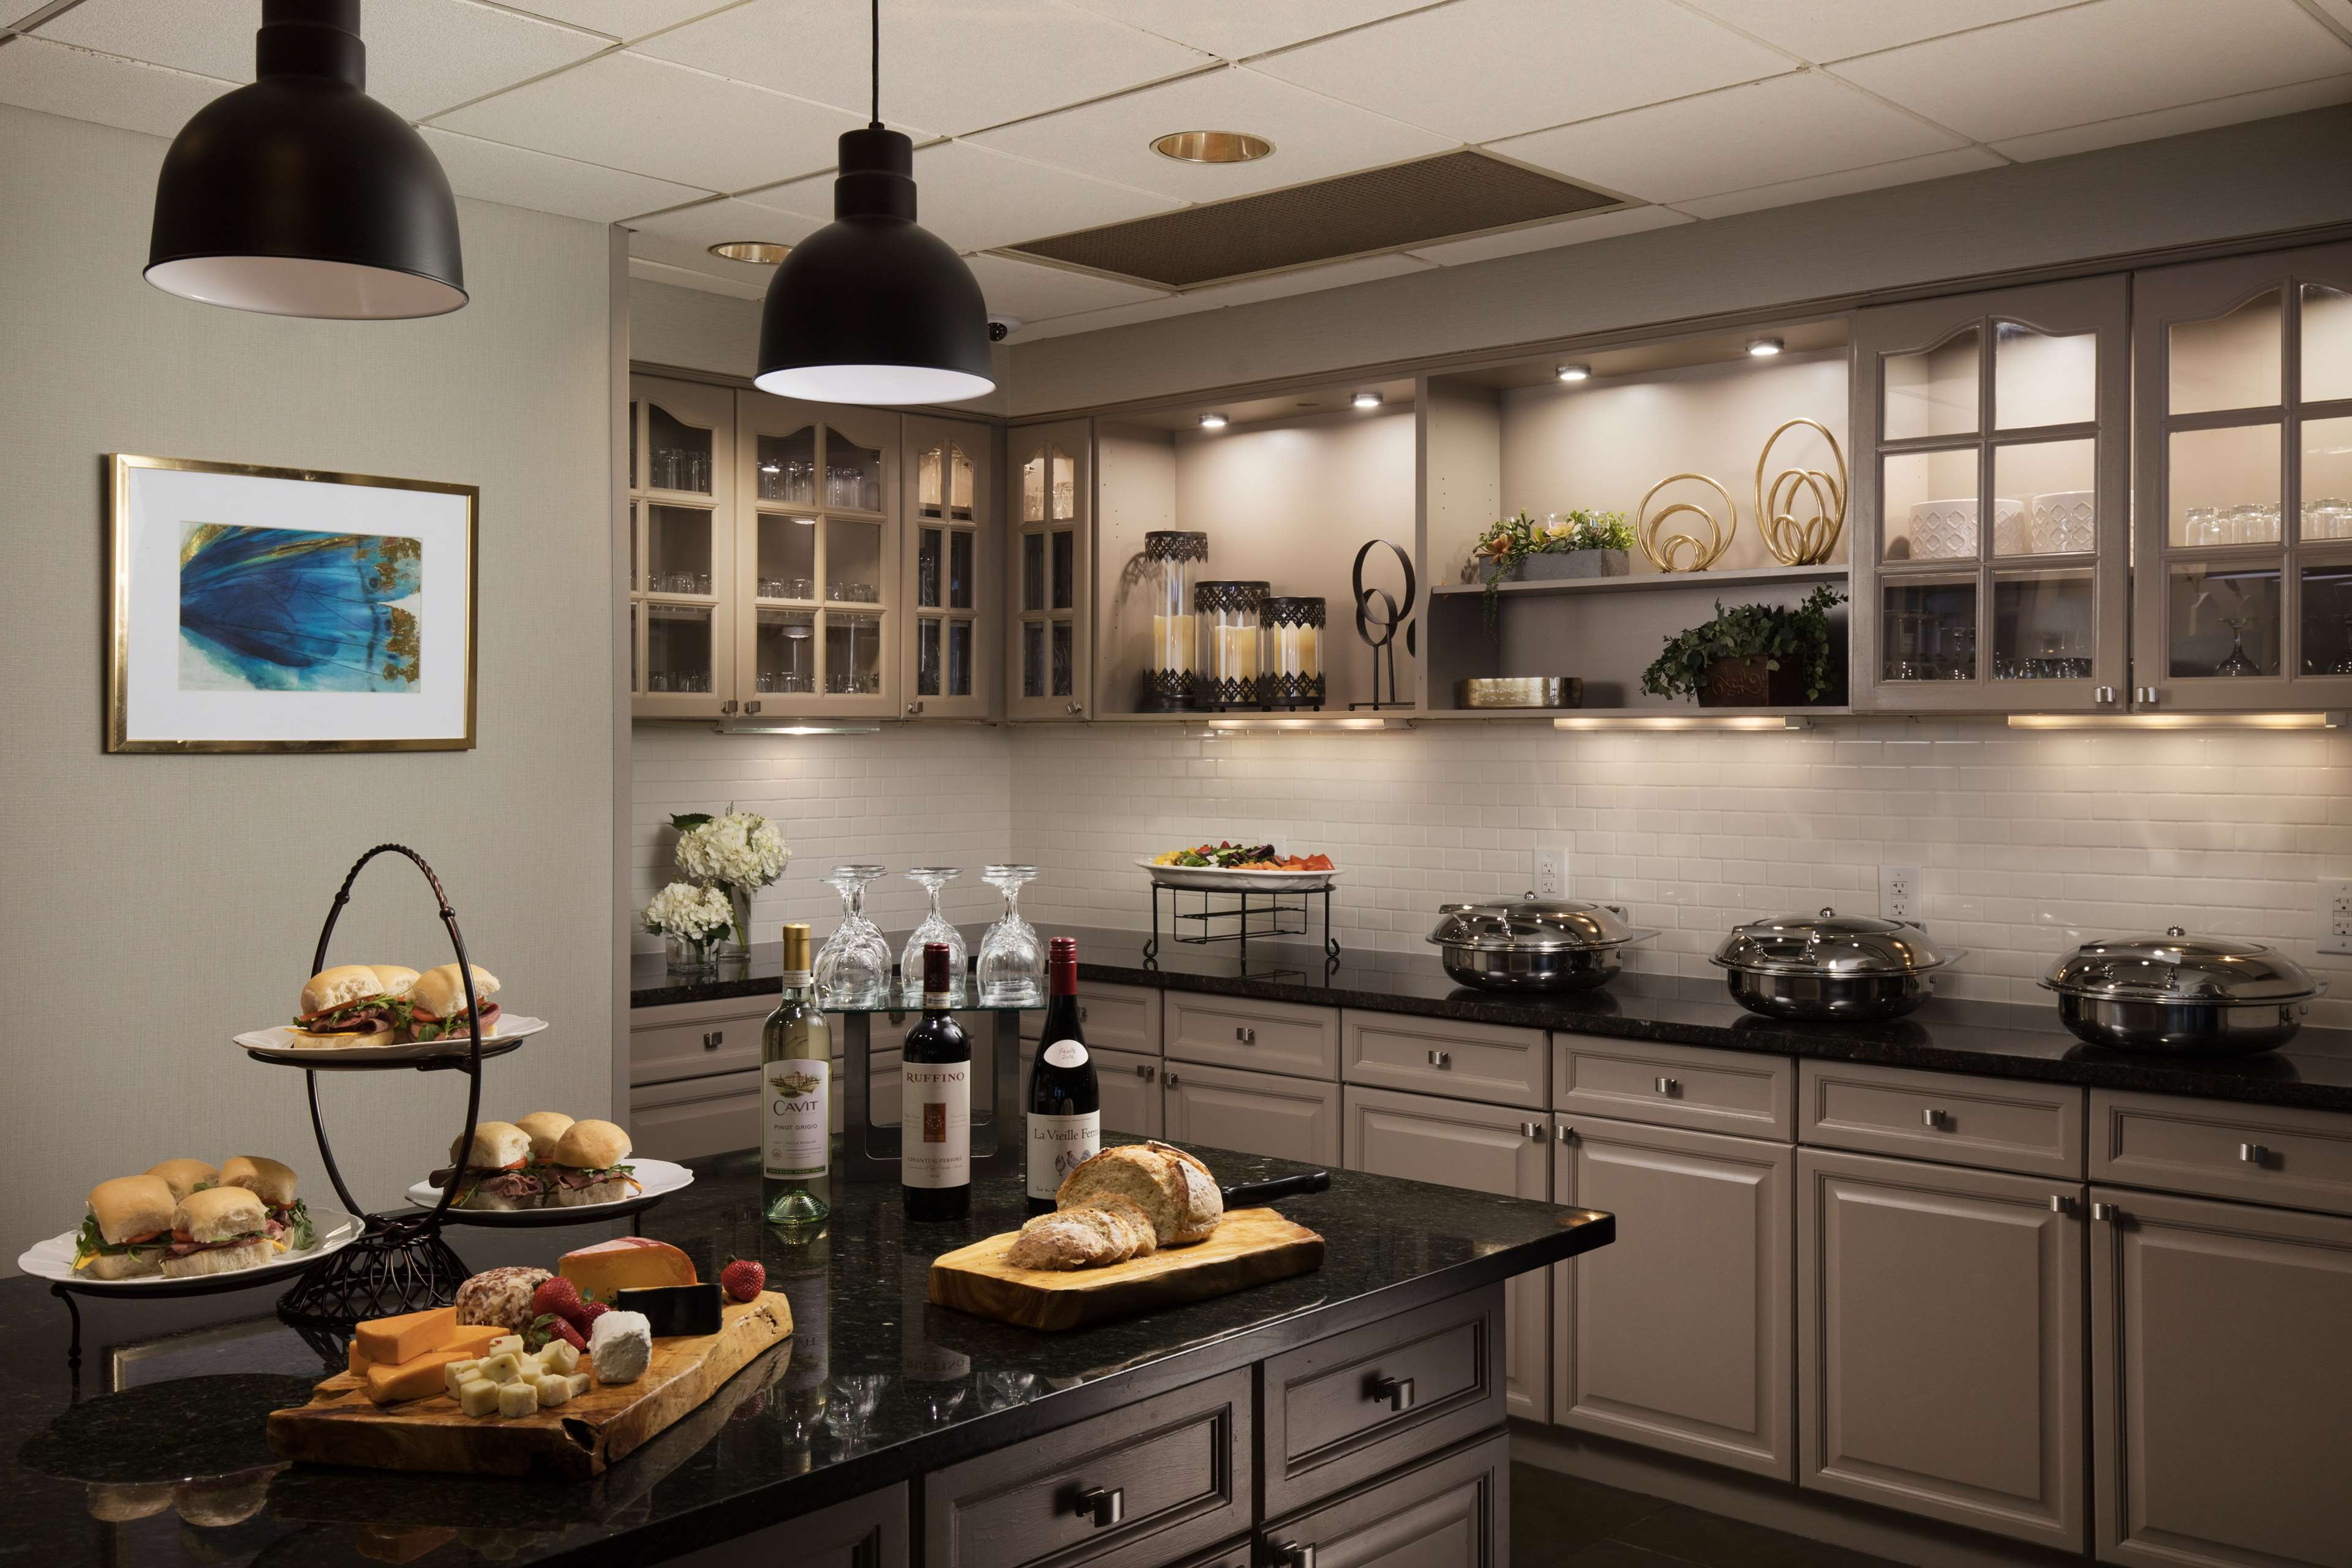 Homewood Suites by Hilton Lubbock image 11